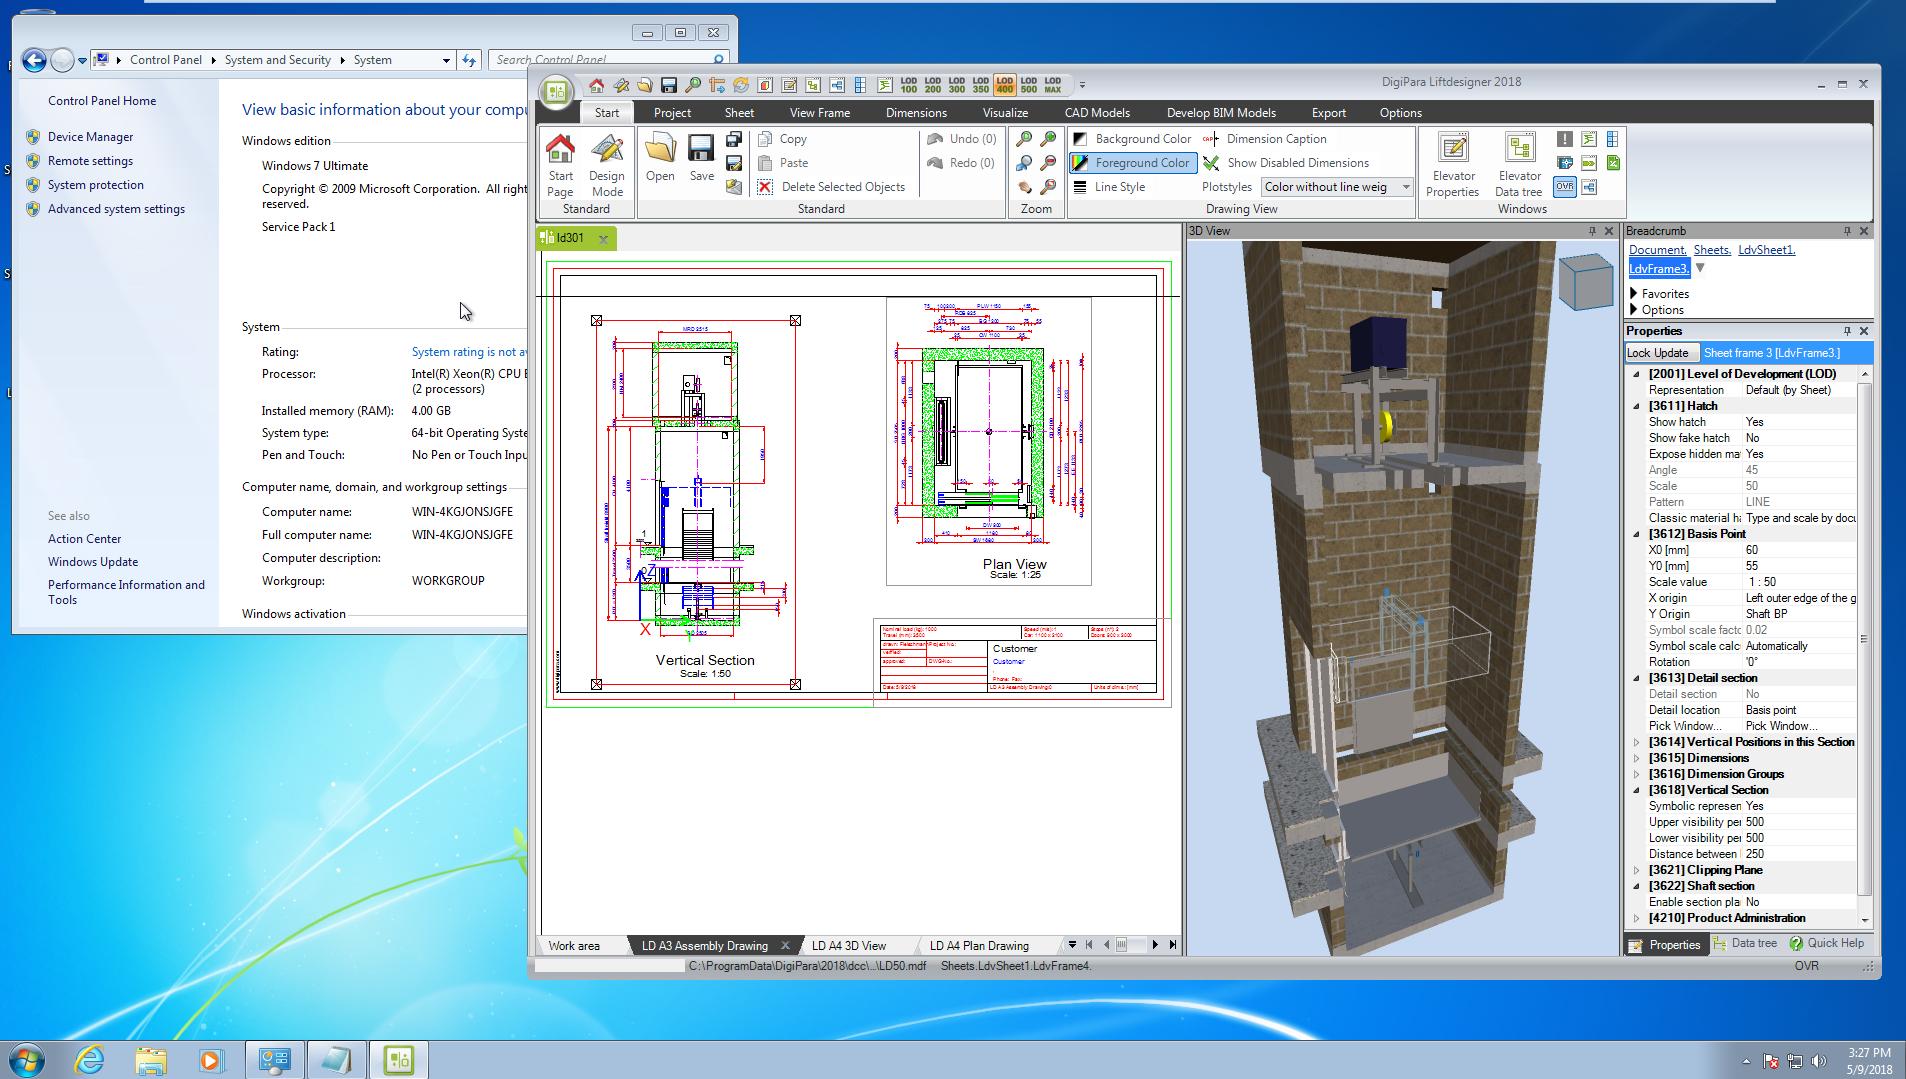 DigiPara Liftdesigner 2018 and later on Windows 7